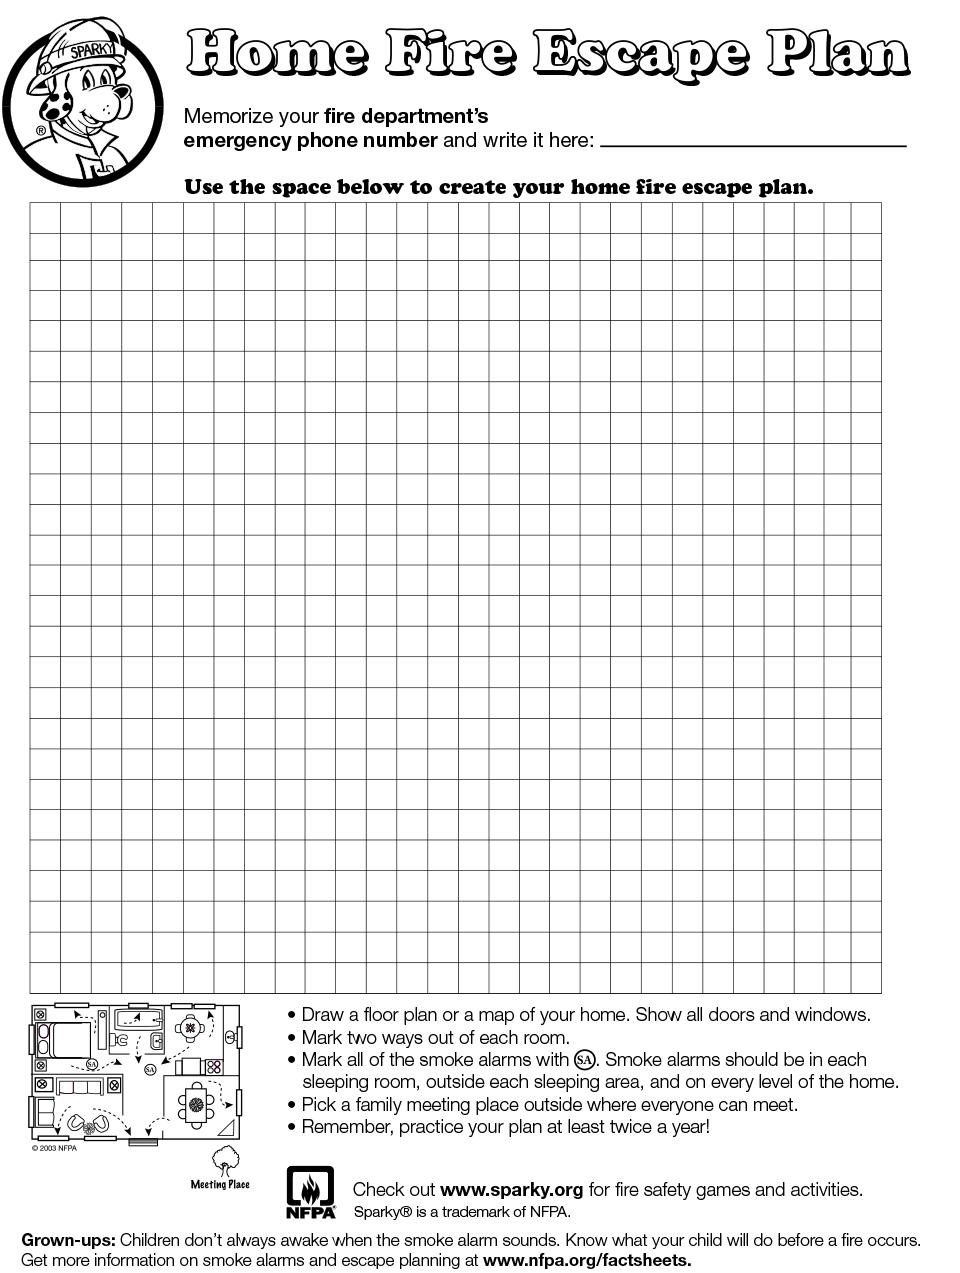 escapeplan2 make your own home fire escape plan,Home Fire Plan